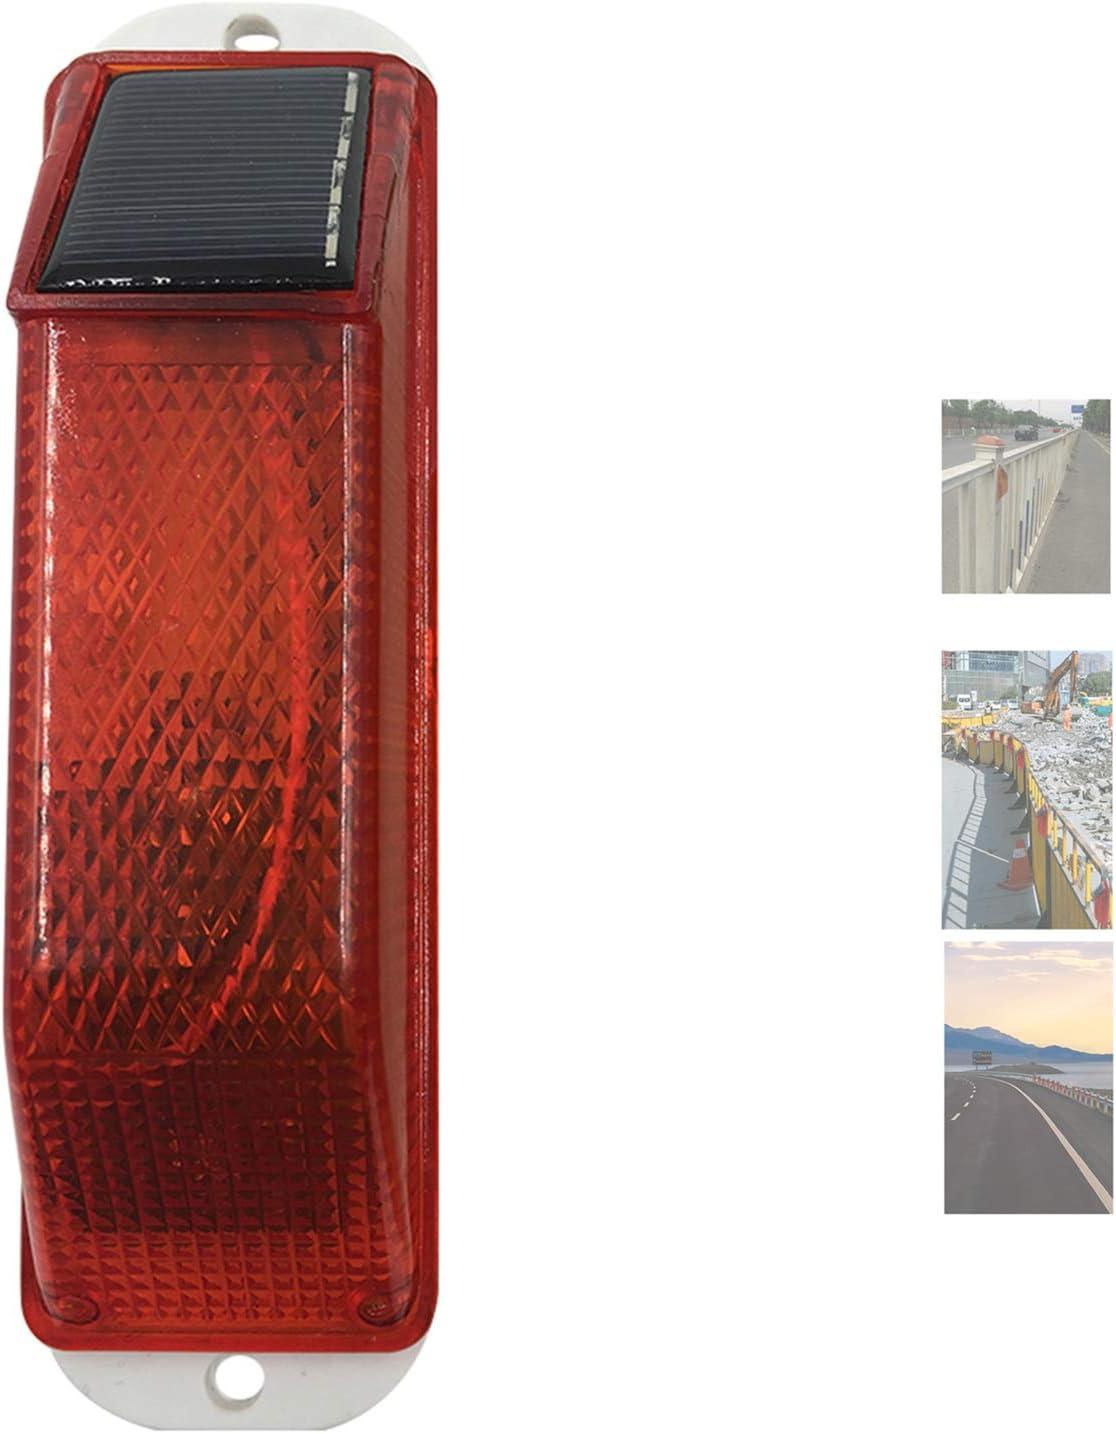 Solar Warning Light Sensitive Strobe Flash Warning LED Caution Lamp Flashing Barricade Safety Sign Road Construction Signs Flash Traffic Lights Flicker Beacon Lamps (Red)